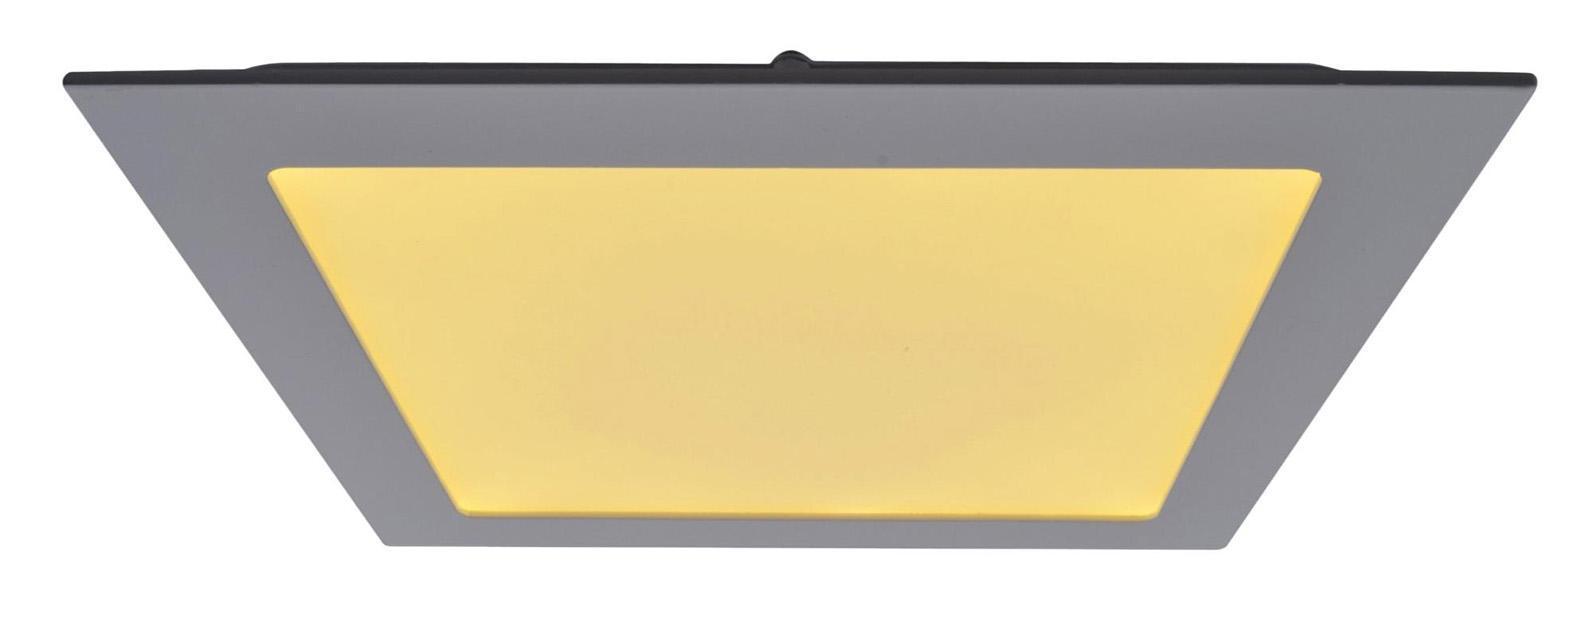 A2418PL-1WH FINE Встраиваемый светильникA2418PL-1WH18W LED; 1440 lm Материал: Арматура: Алюминий / Элемент декора: Пластик Размер: 225x225x25 Цвет: Белый